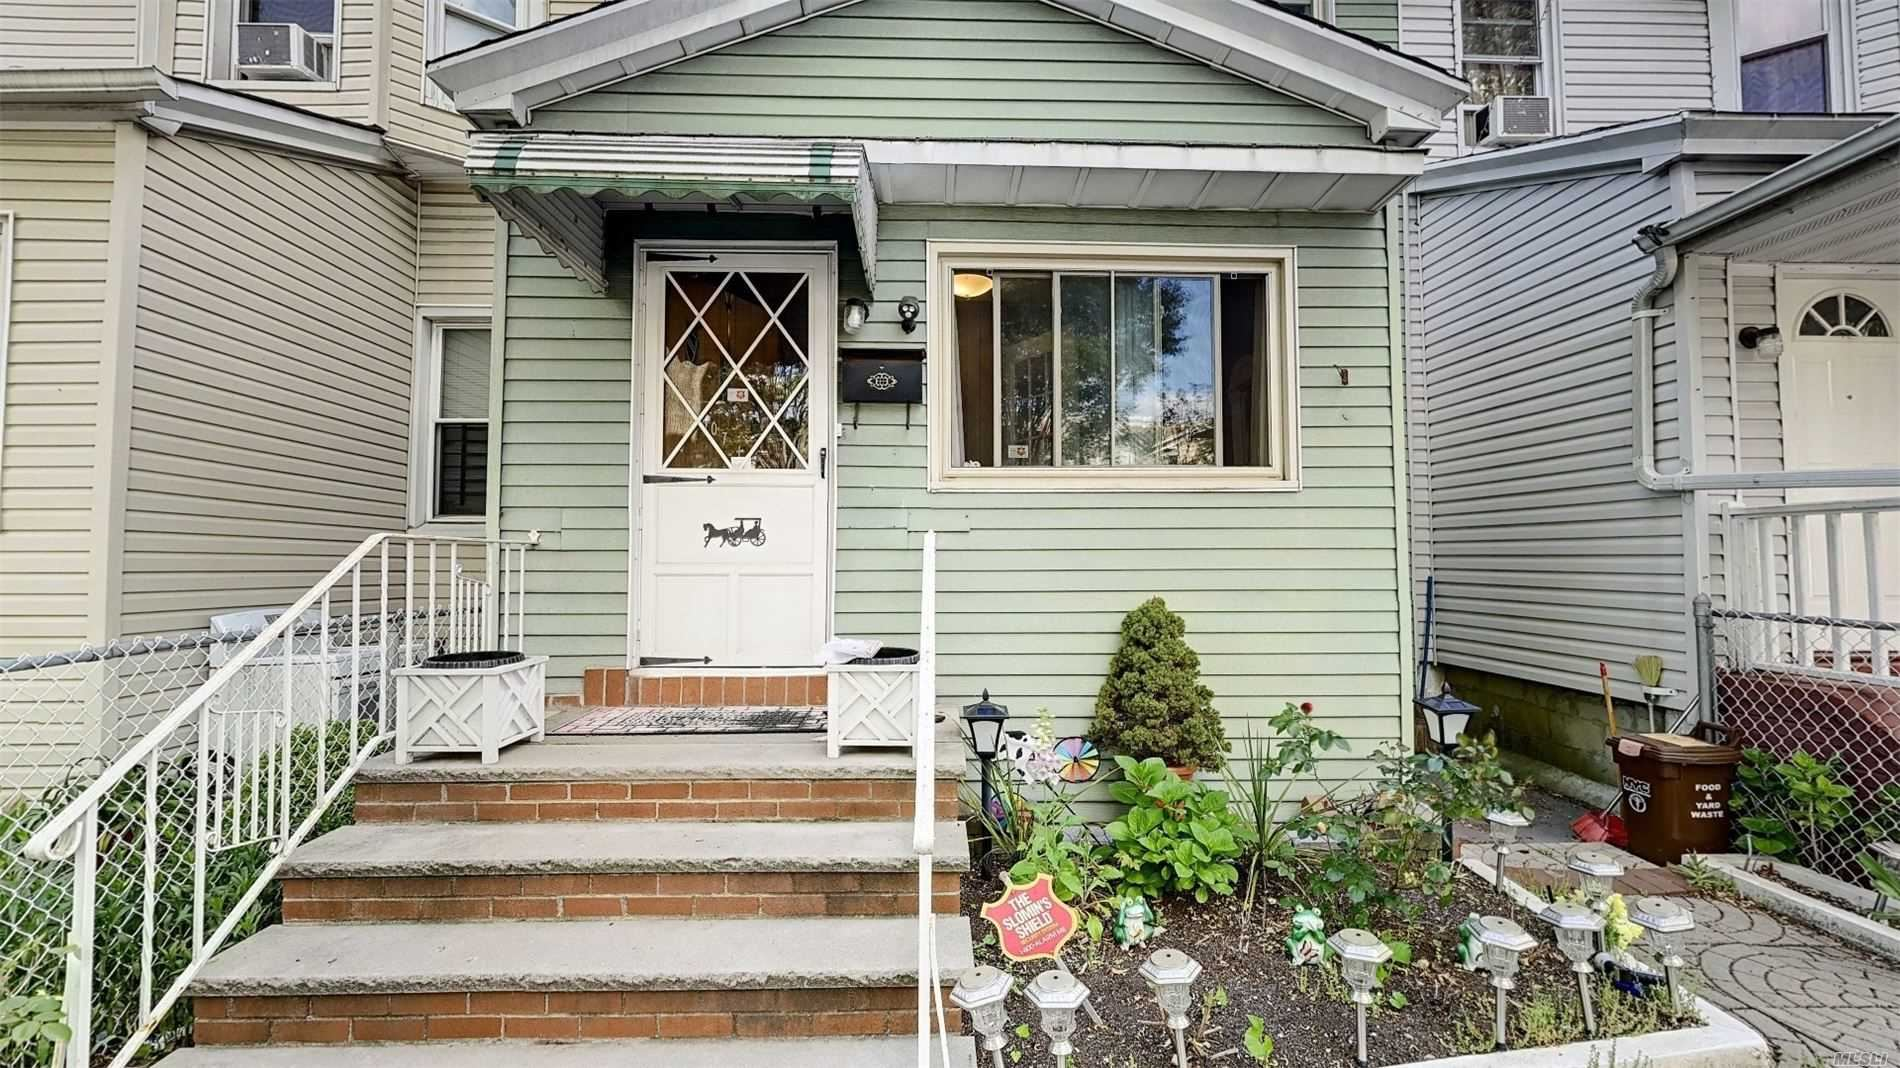 107-40 111th Street, Richmond Hill, NY 11419 - MLS#: 3218000